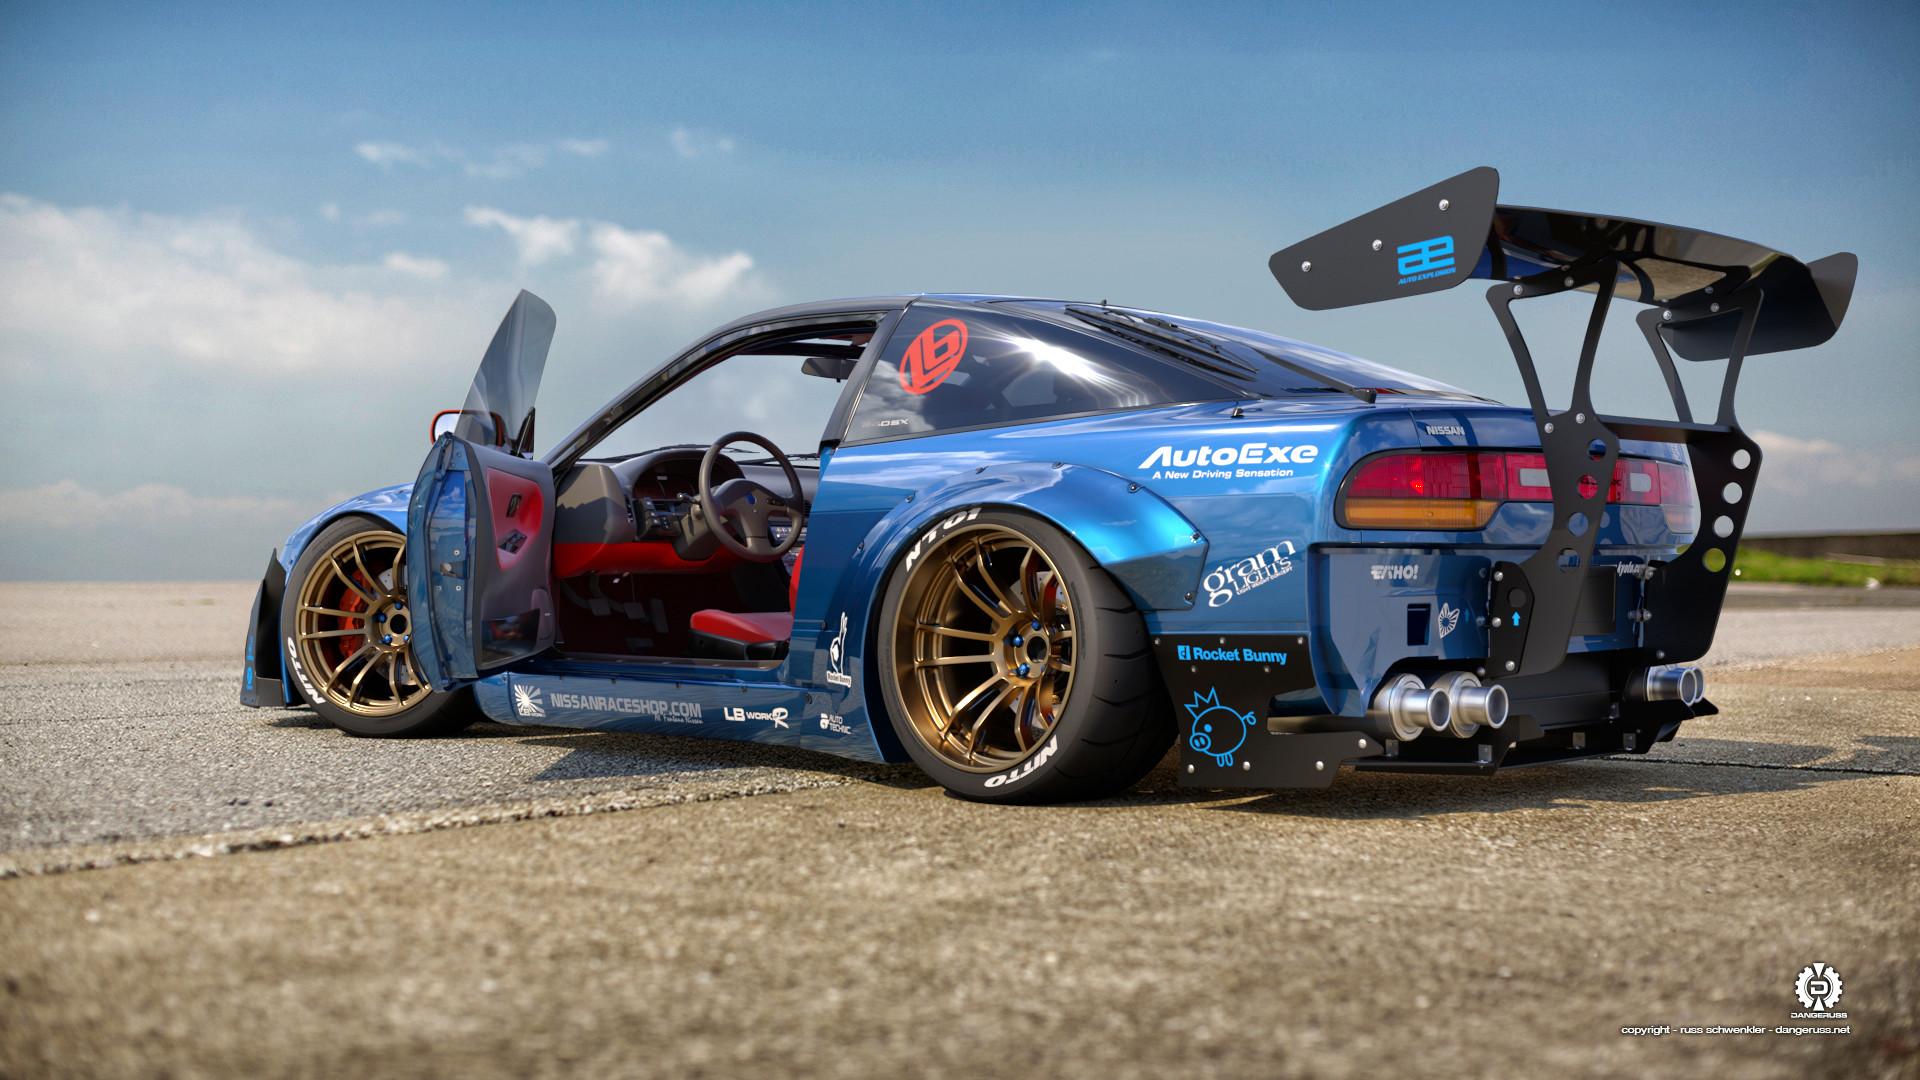 Res: 1920x1080, Fahrzeuge - Nissan 240SX Nissan Autos Fahrzeug Rennauto Blue Car Wallpaper